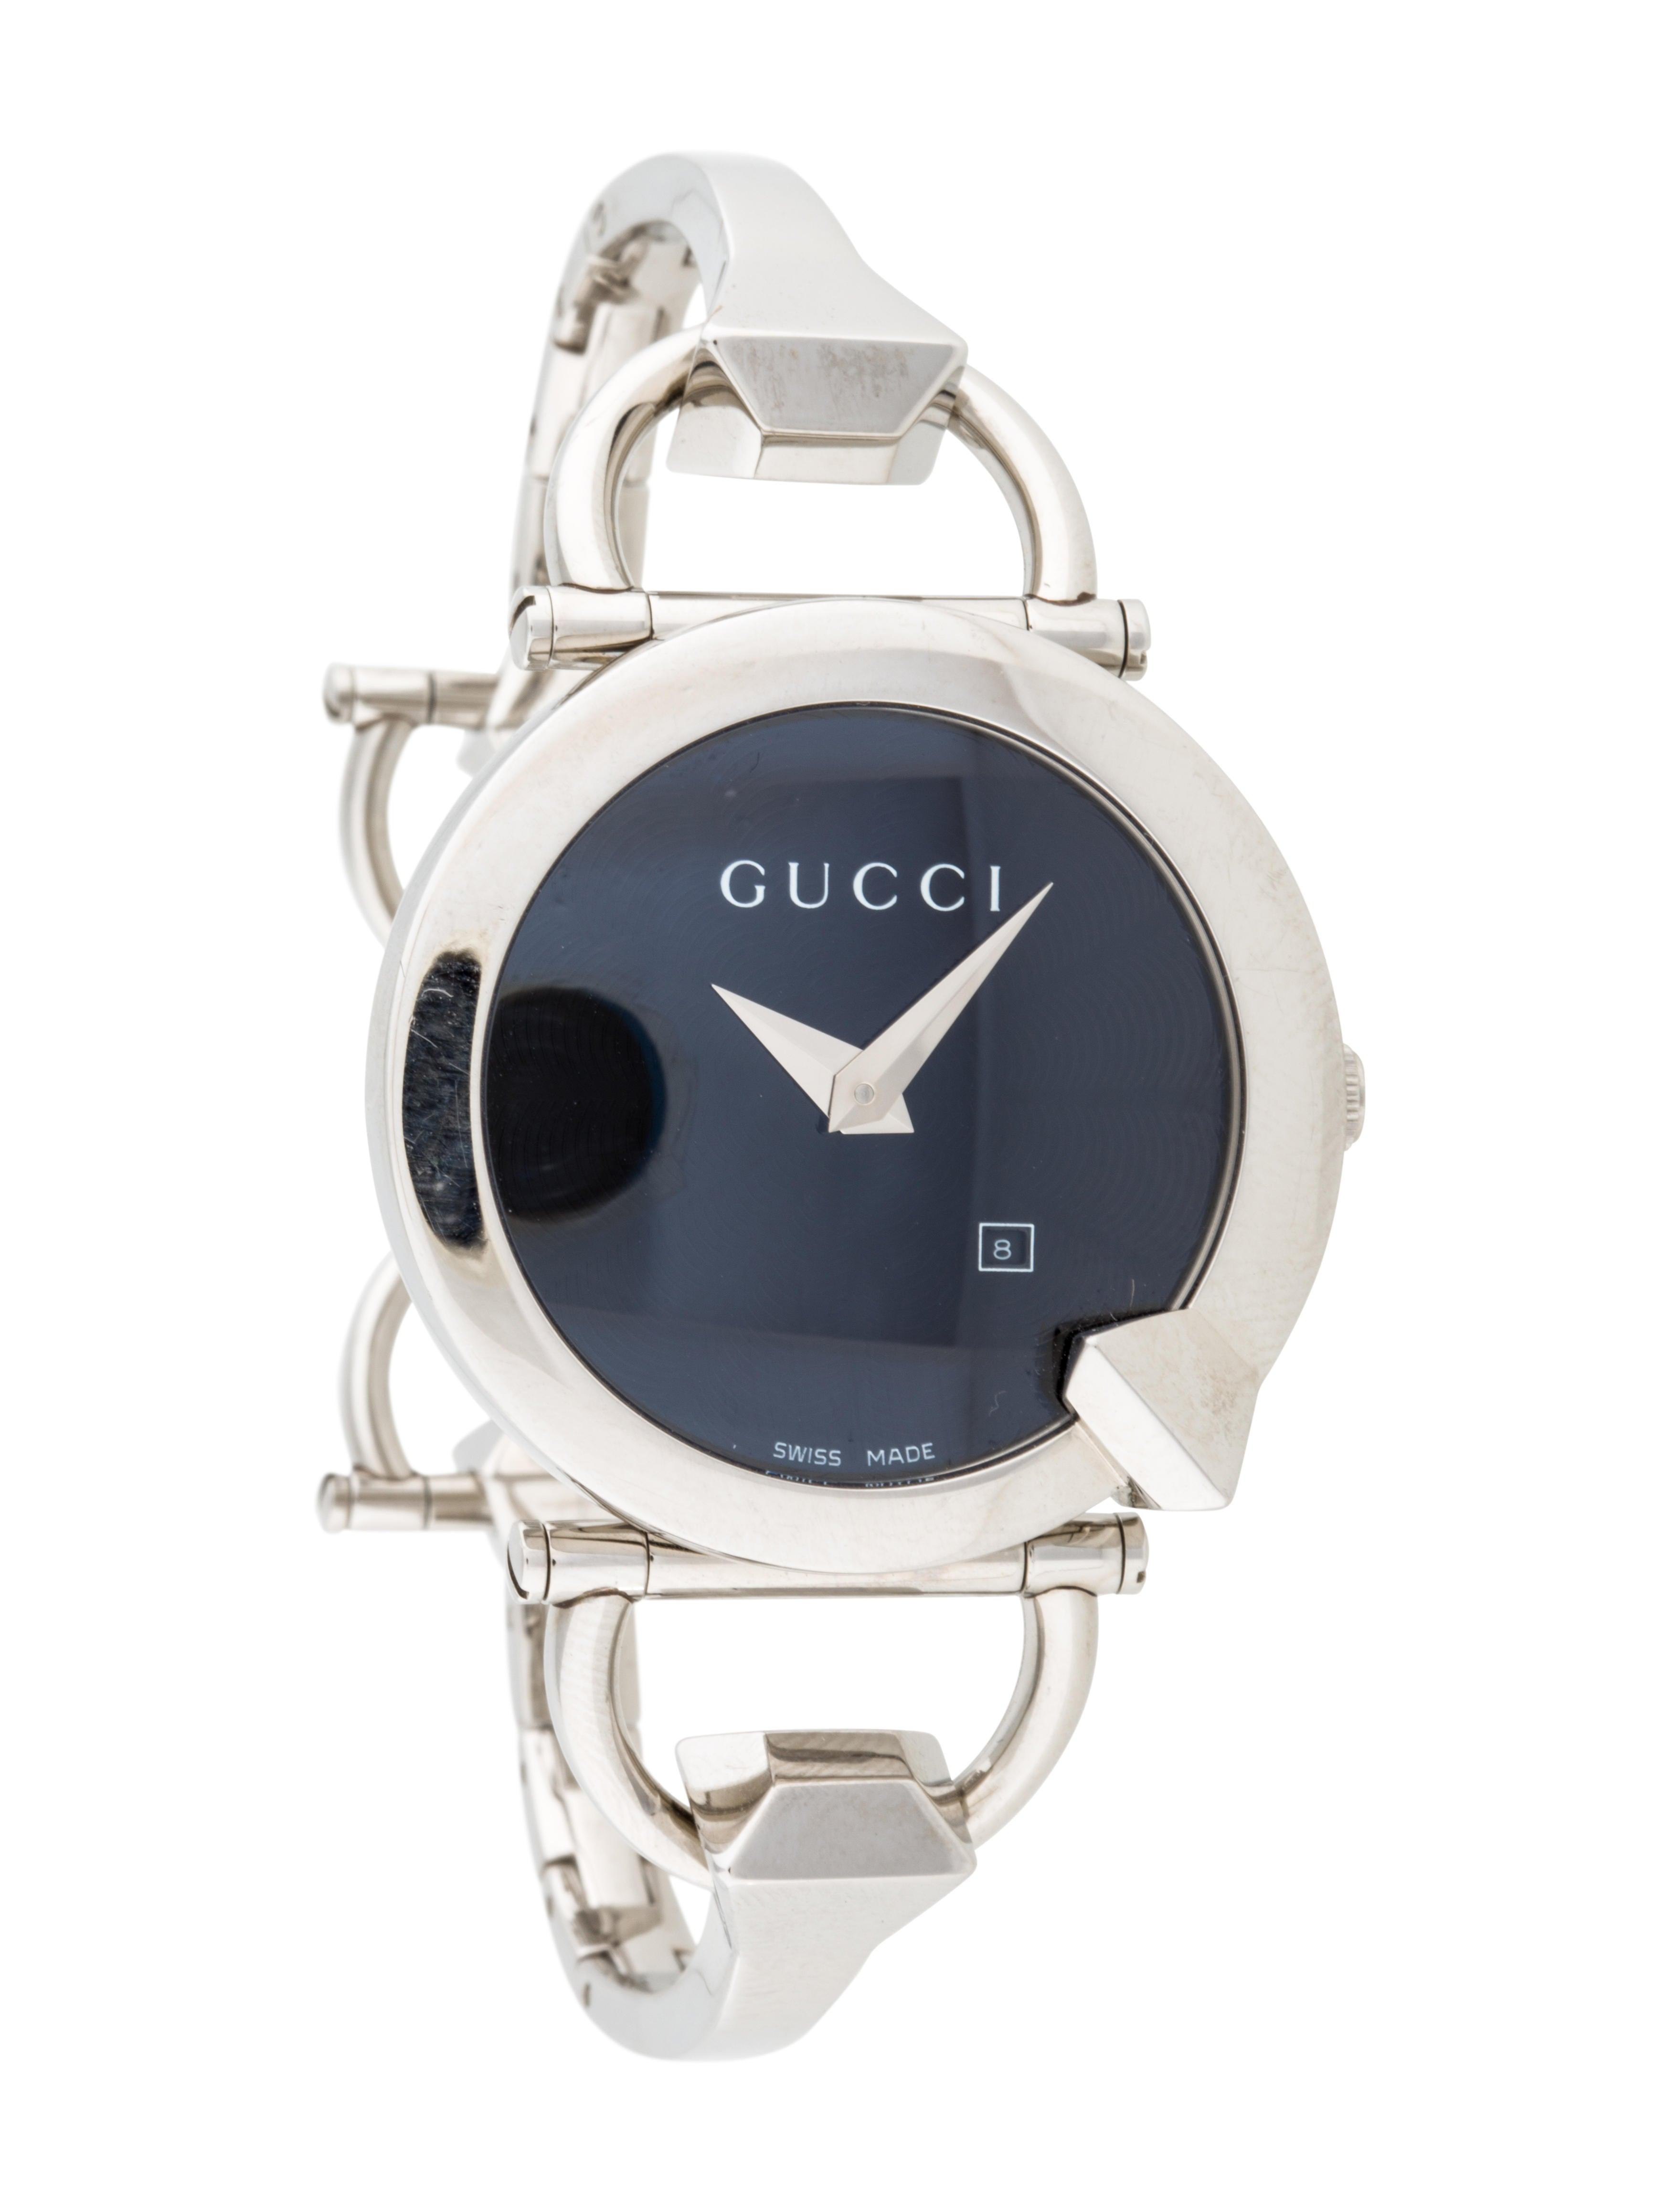 b571eb9e5f3 Gucci Chiodo Watch - Bracelet - GUC73991